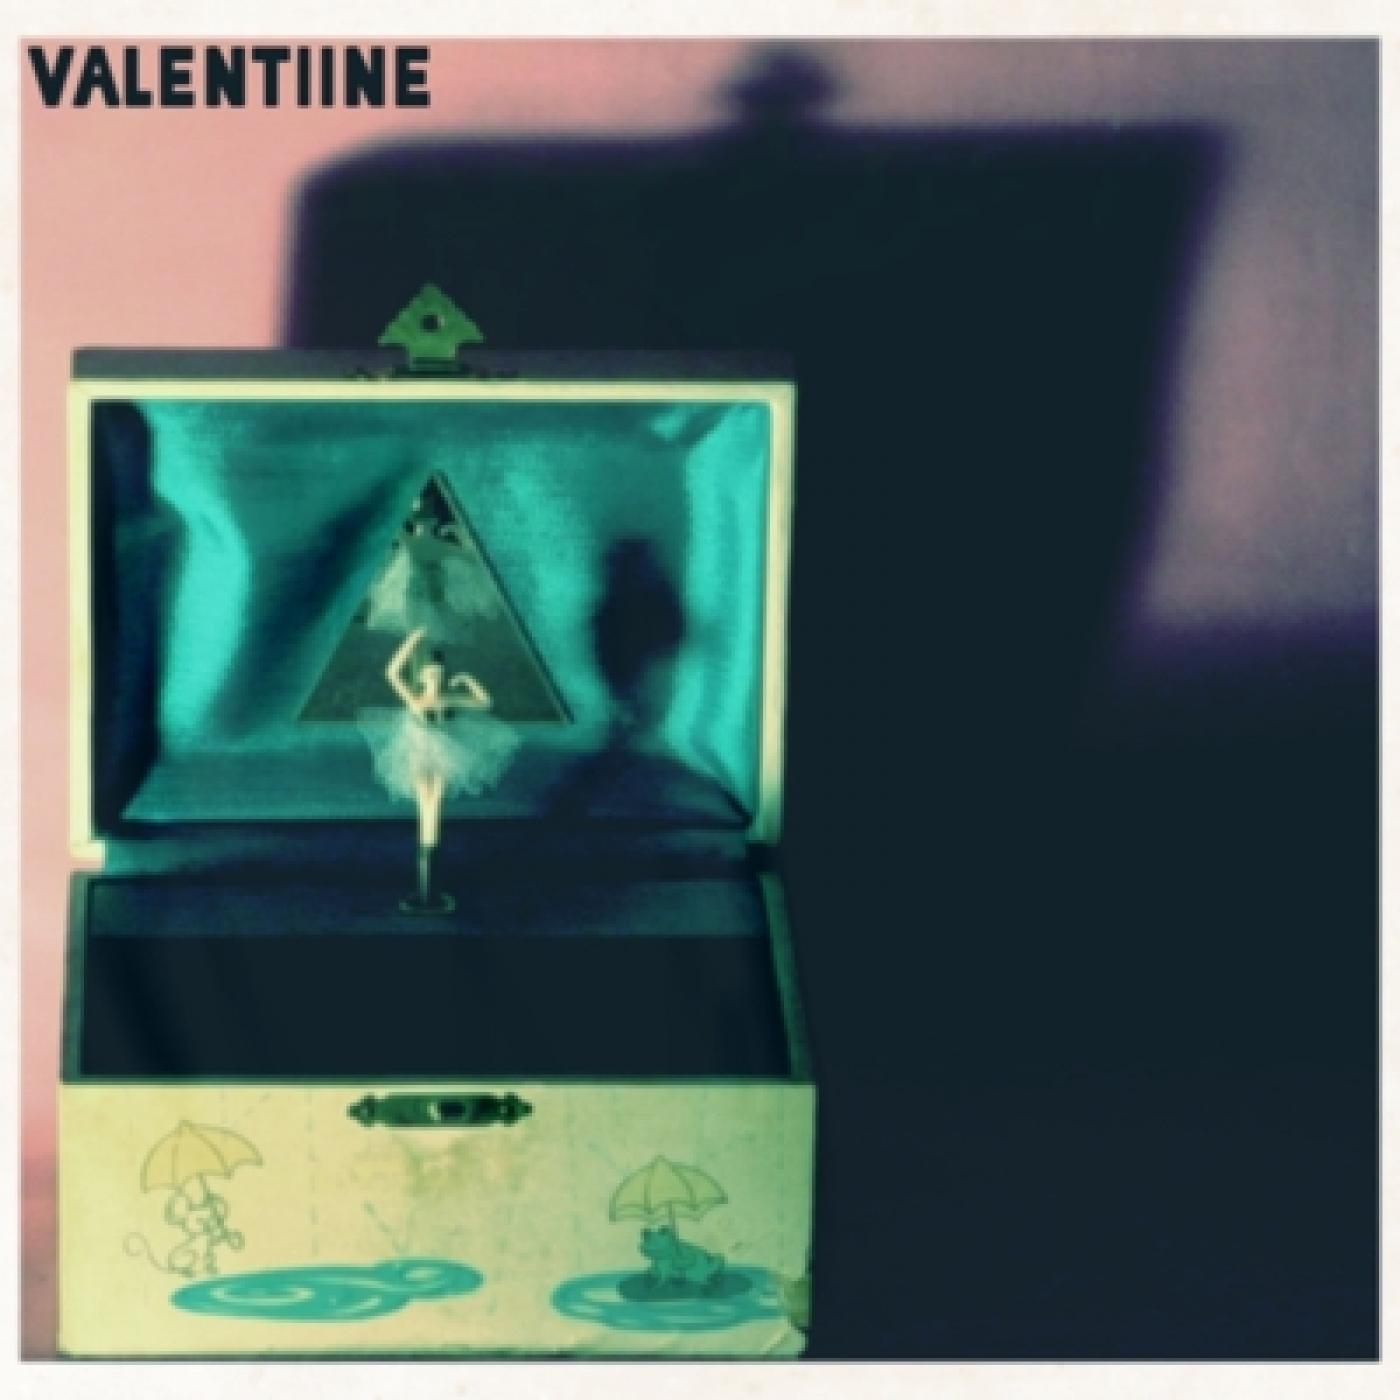 resized valentiine album cover